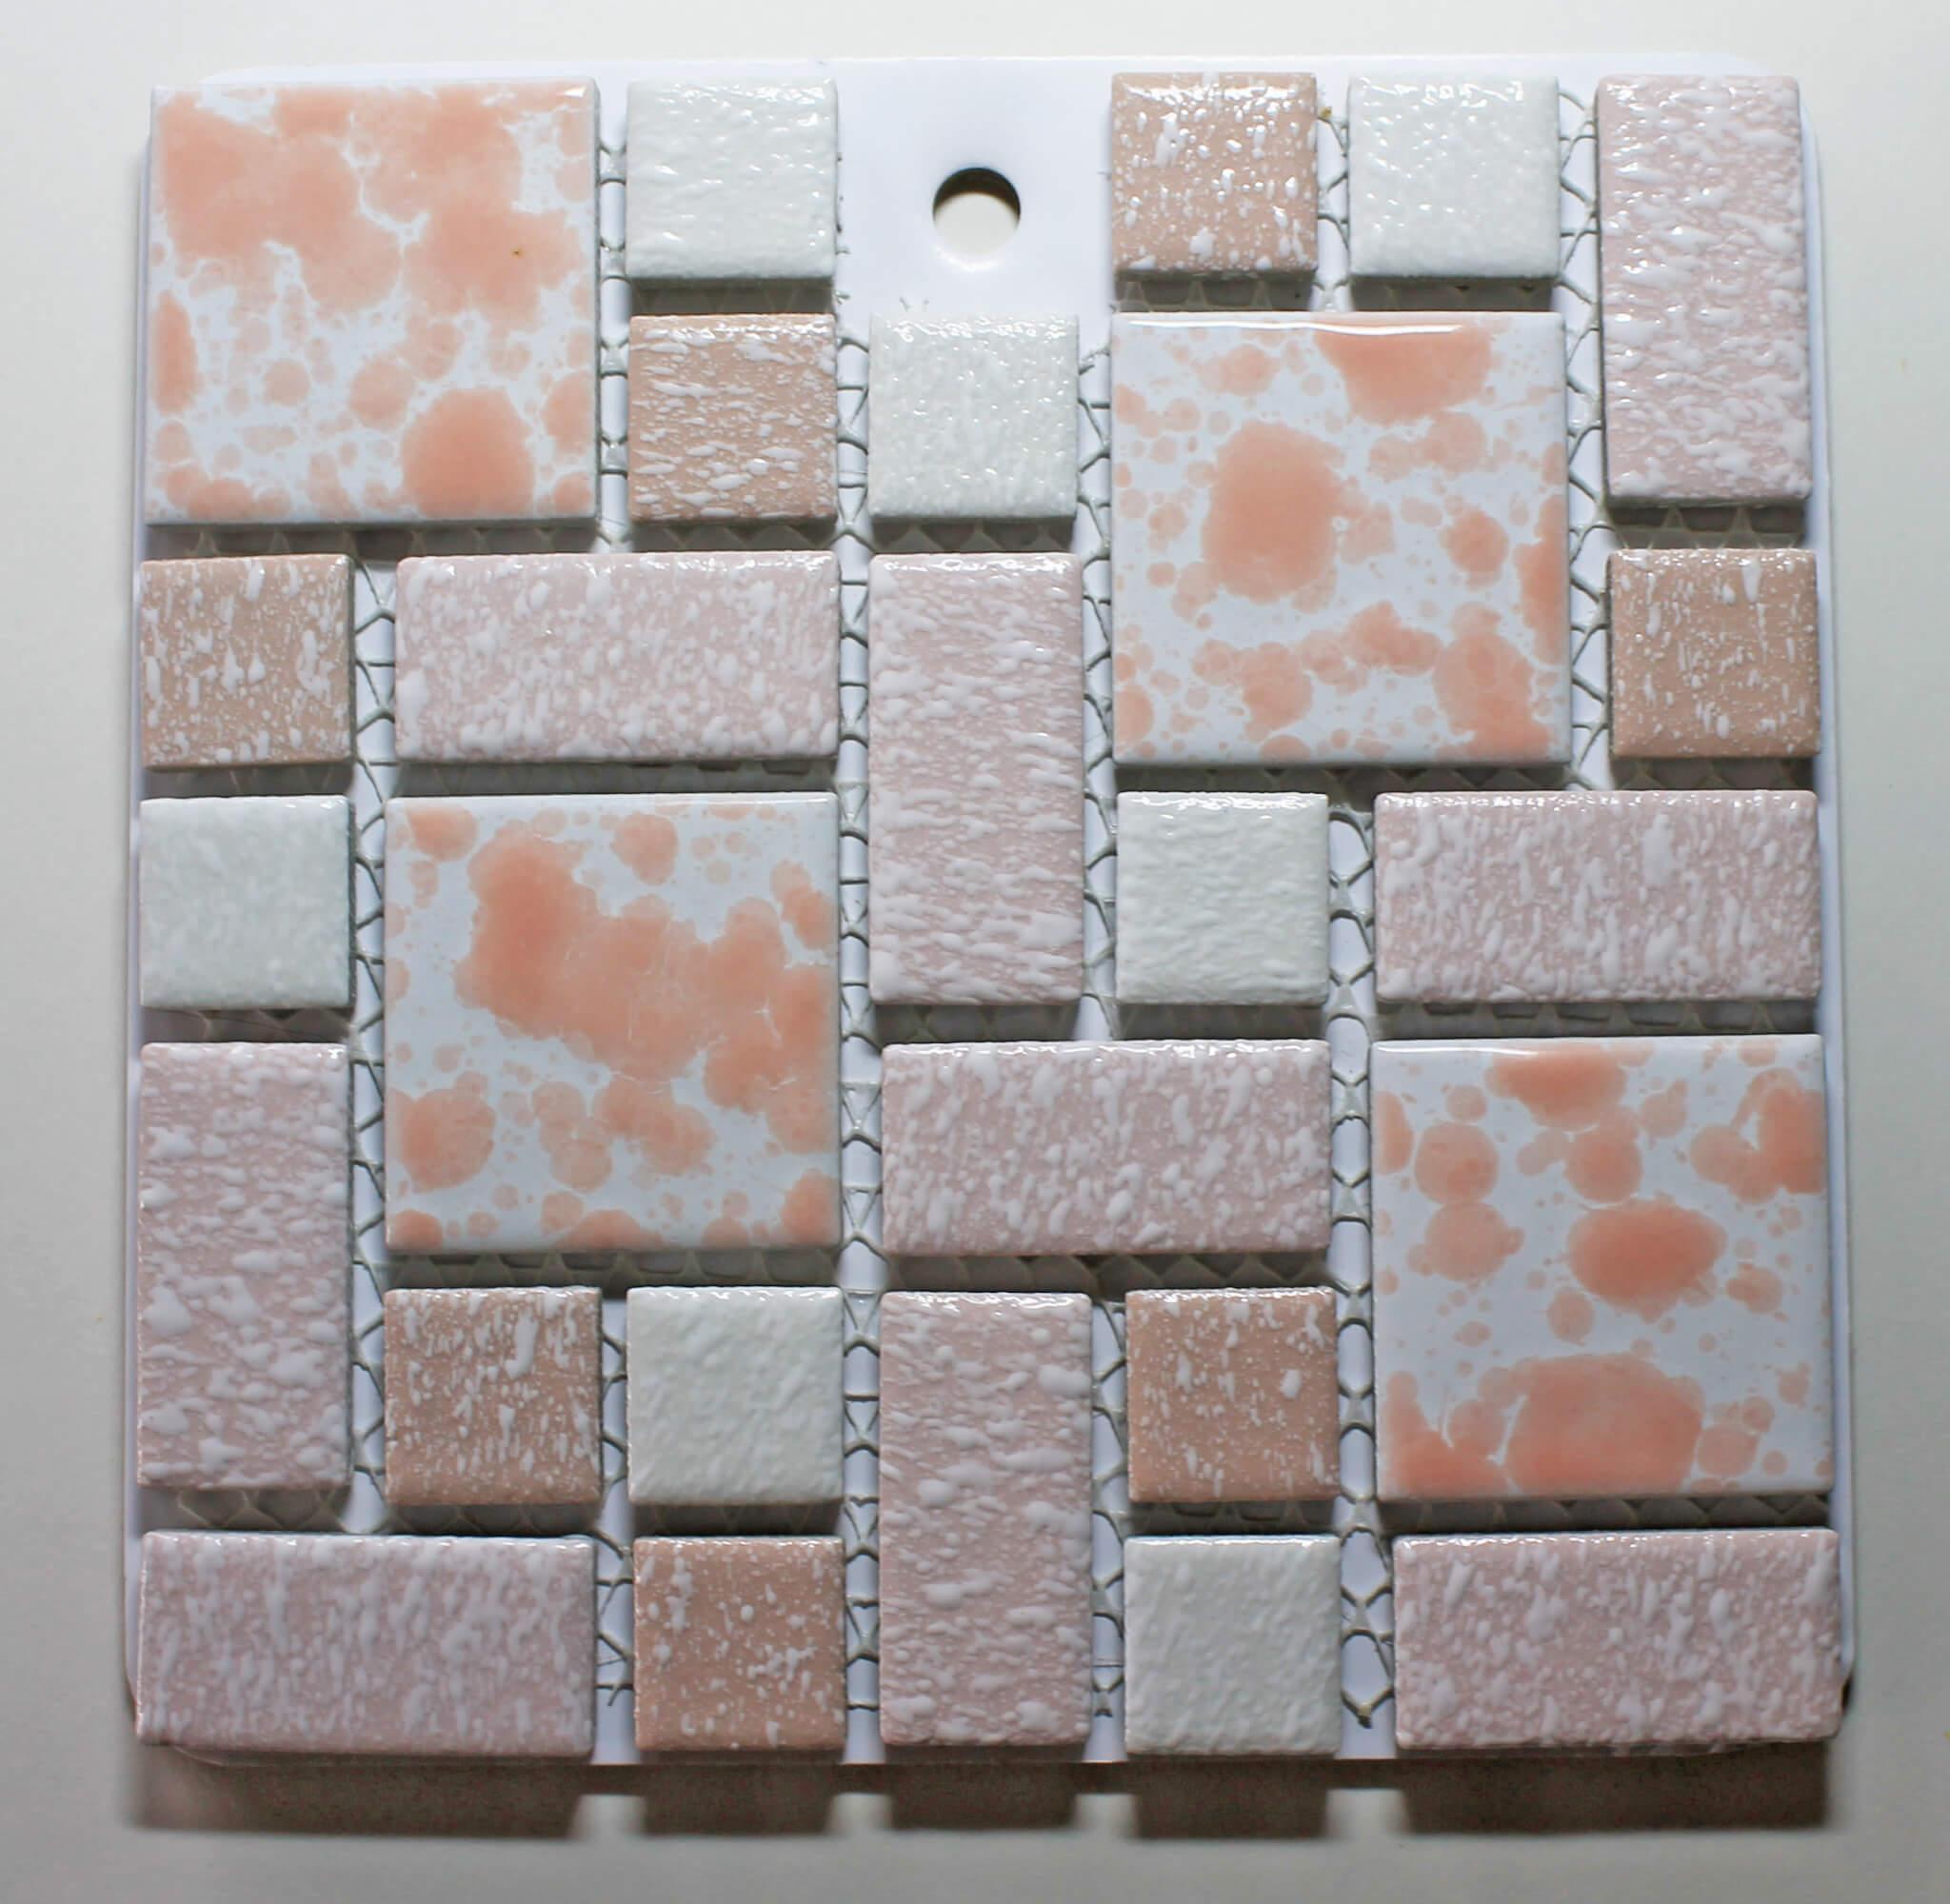 1970s Bathroom Tiles: Mary Elizabeth's Year-long, Little-by-little 1959 Pink